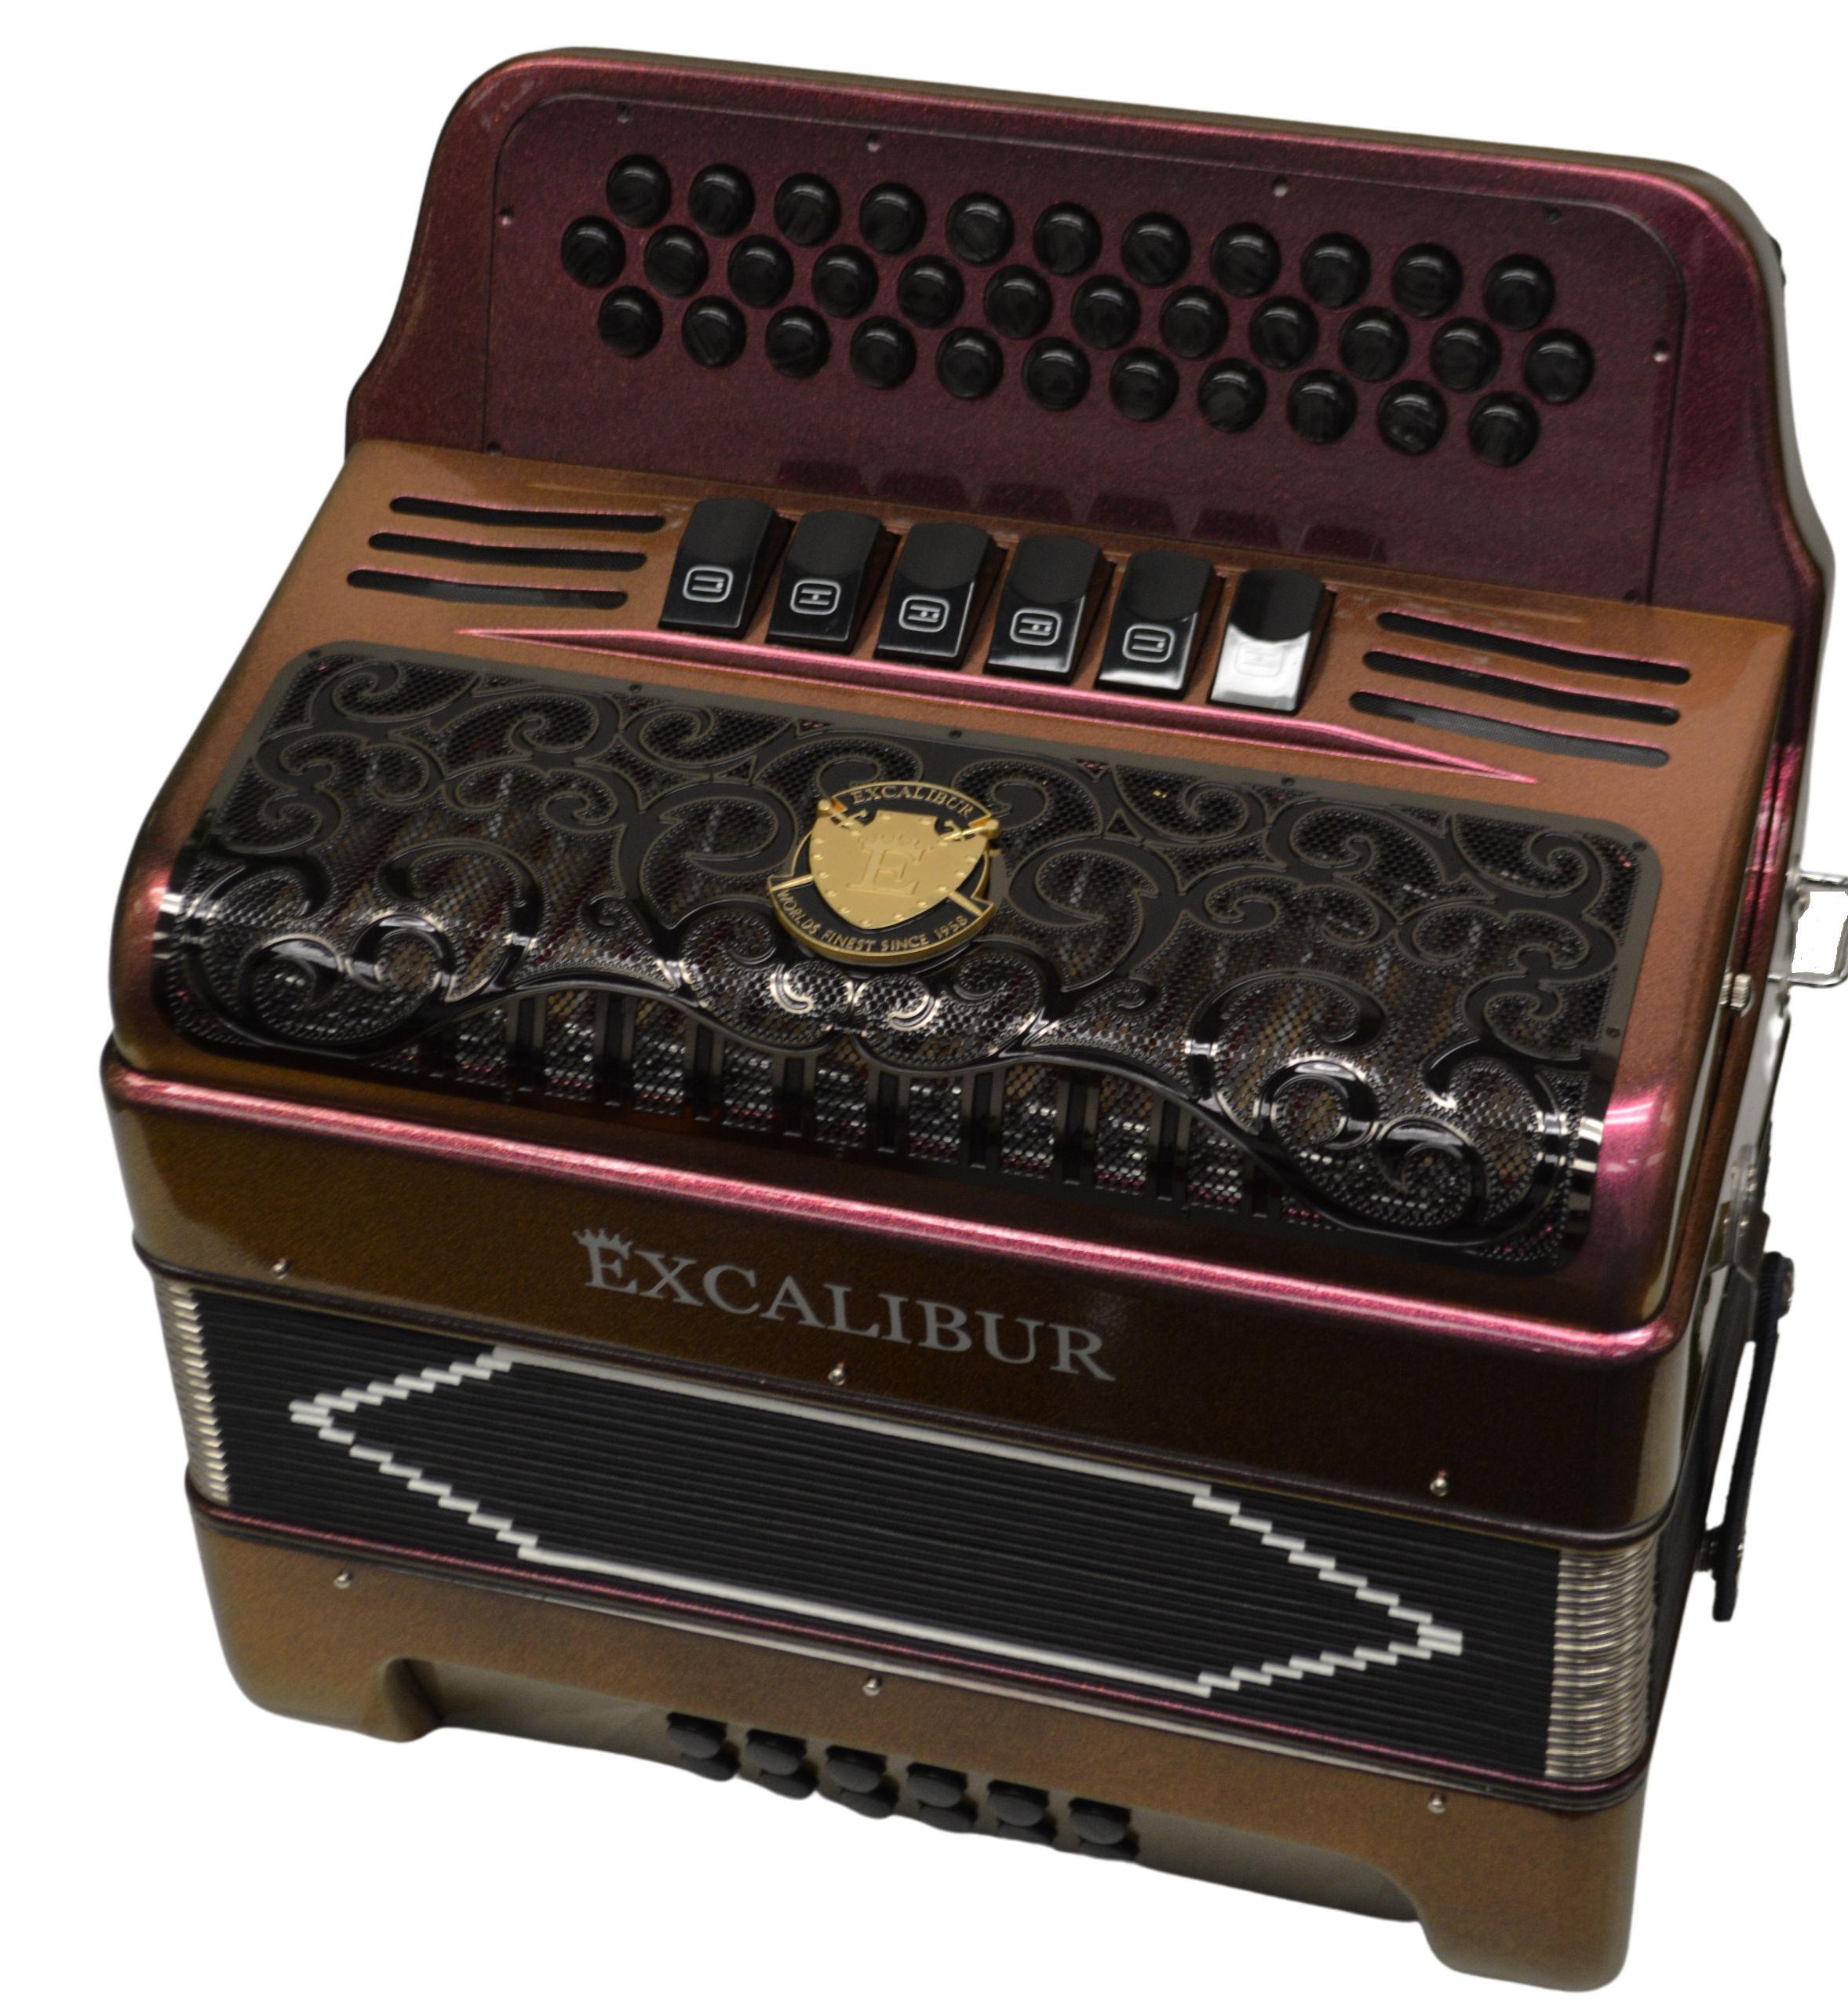 Excalibur PSI LTD 34 Key Two Tone Button Accodion Purple